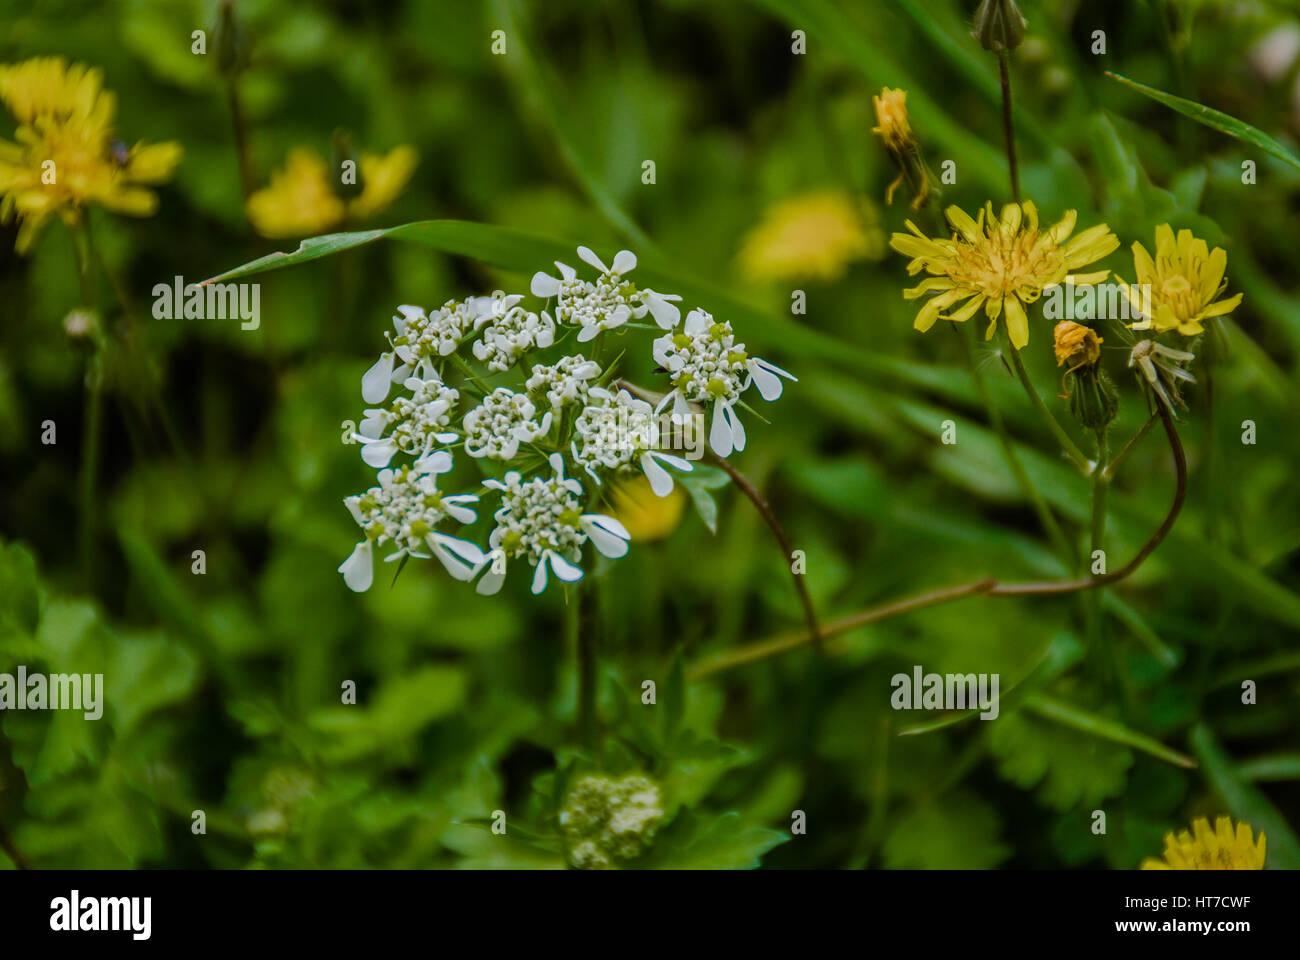 White Tiny Flowers In Naturemelek Otu Angel Flower Stock Photo